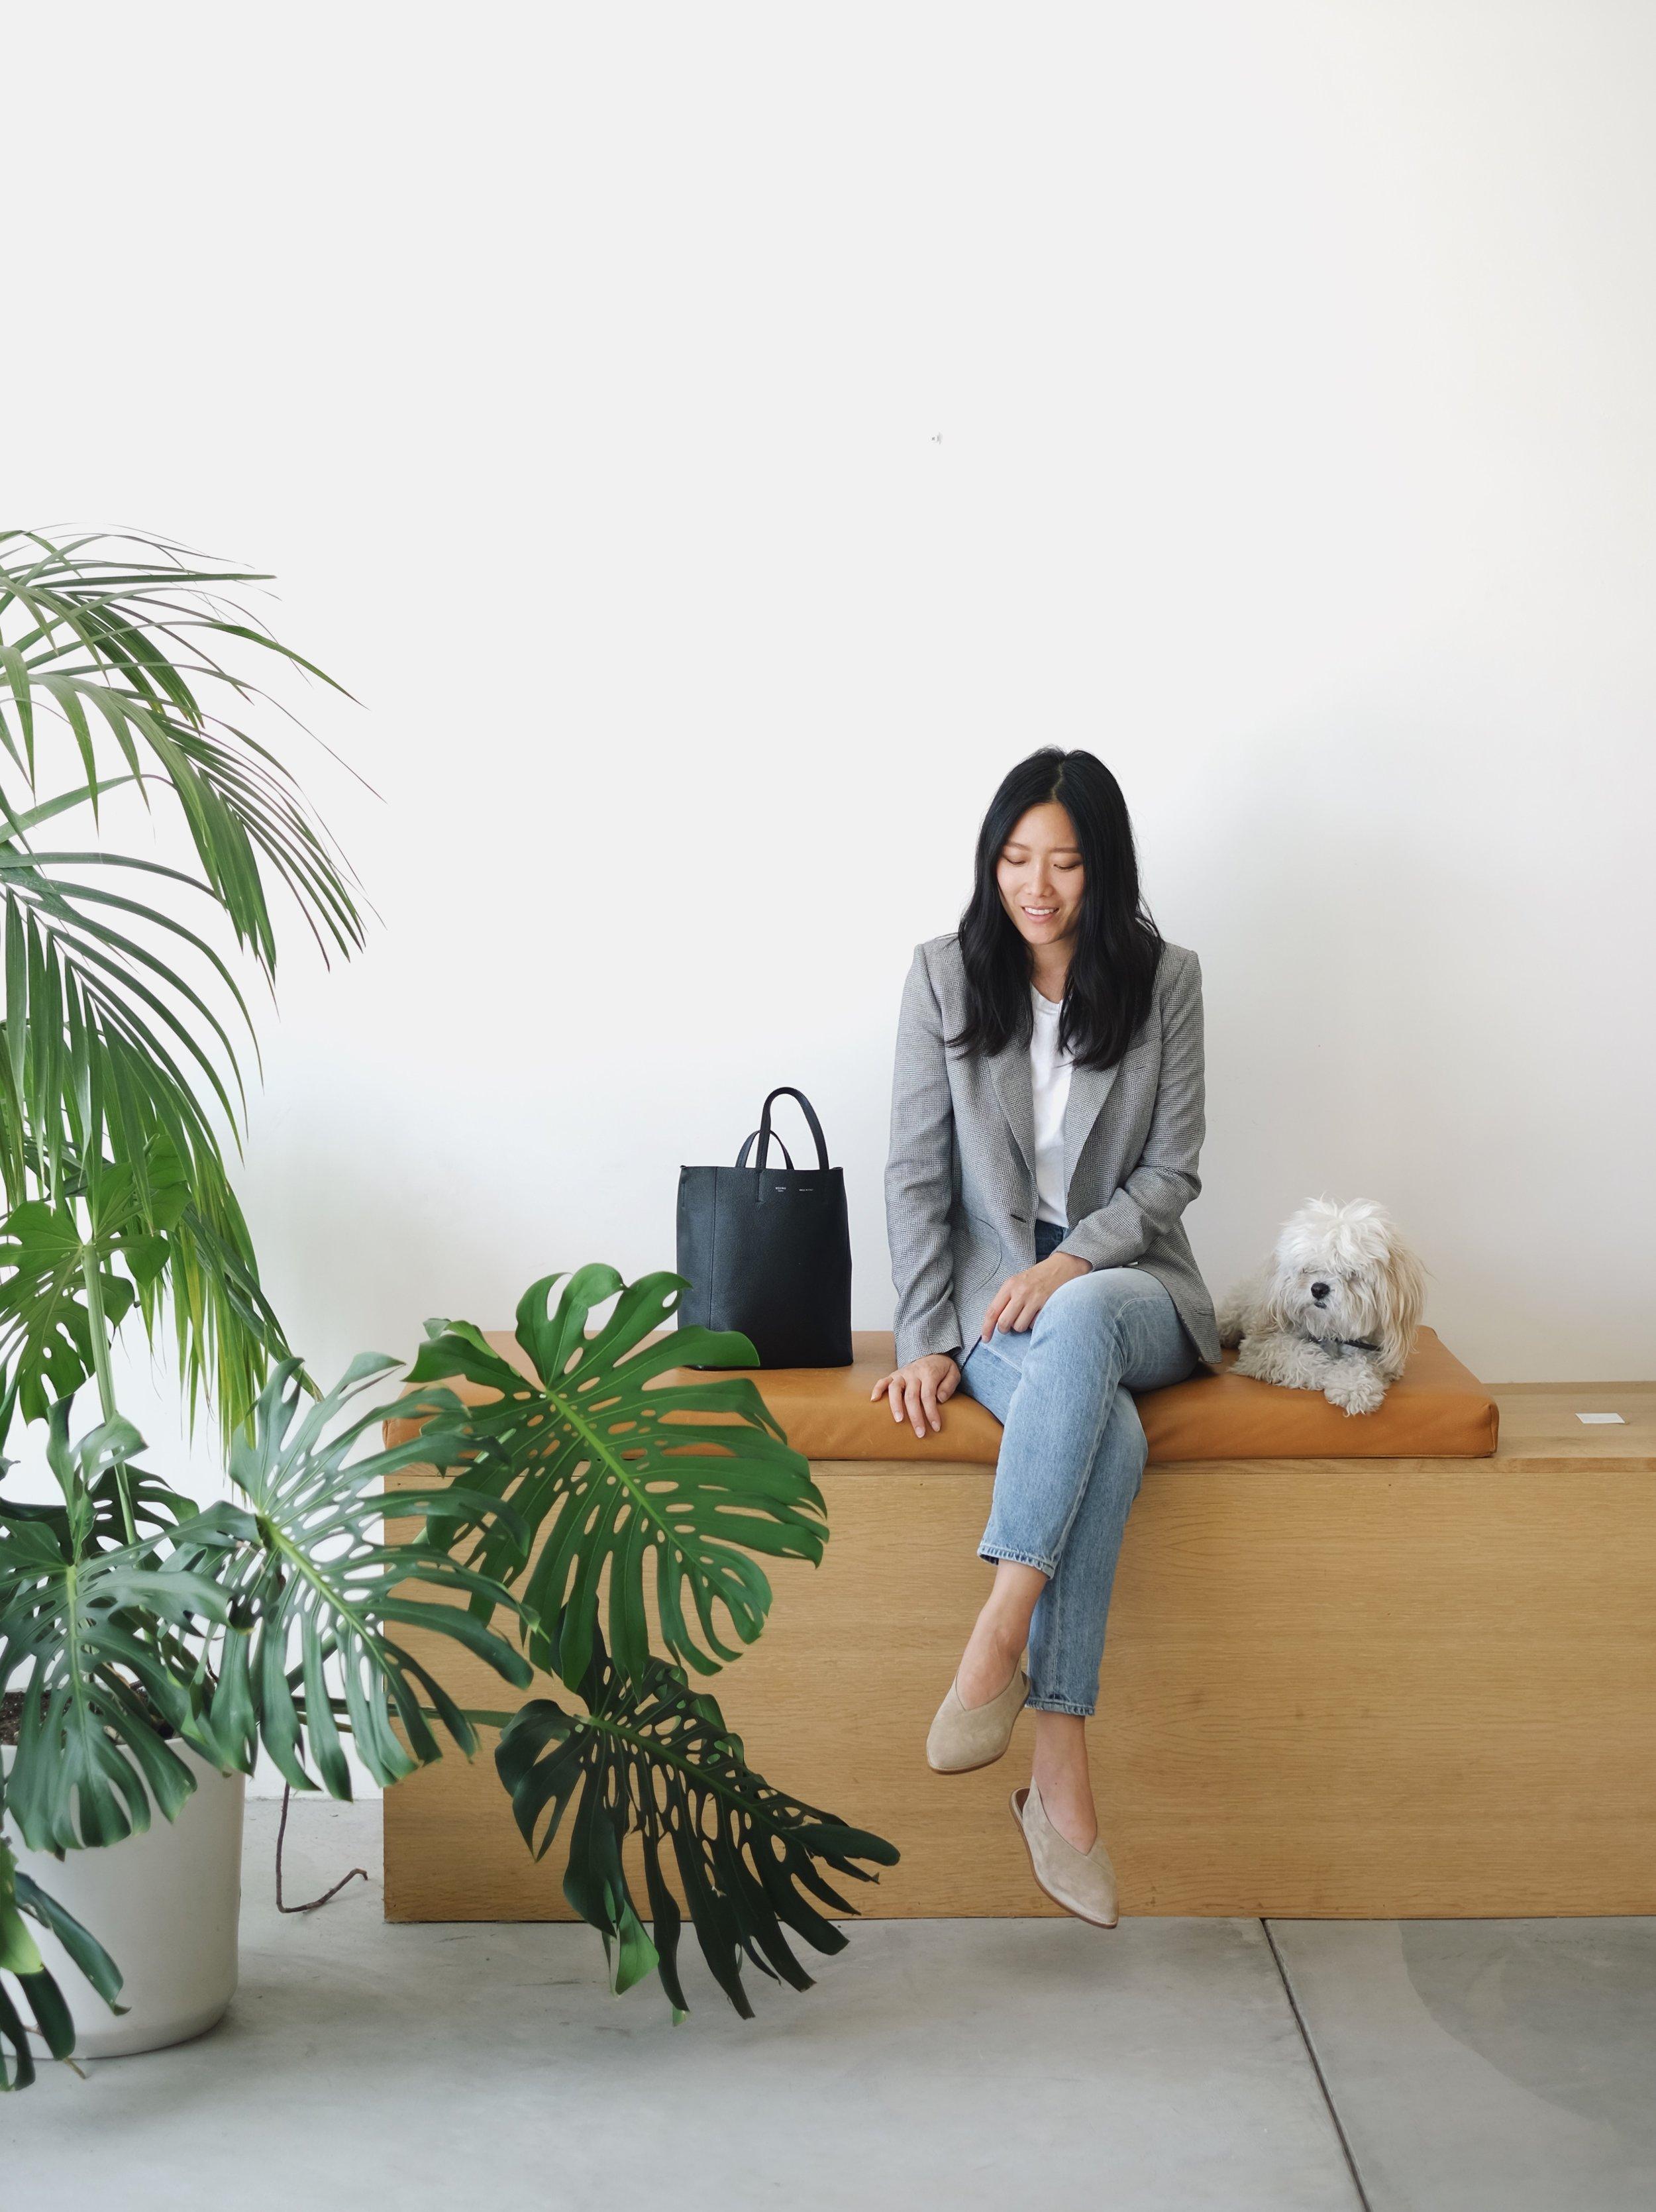 RIKA   Blazer  /  ATP ATELIER   Flats  / CÉLINE   Bag  / CITIZENS OF HUMANITY   Jeans